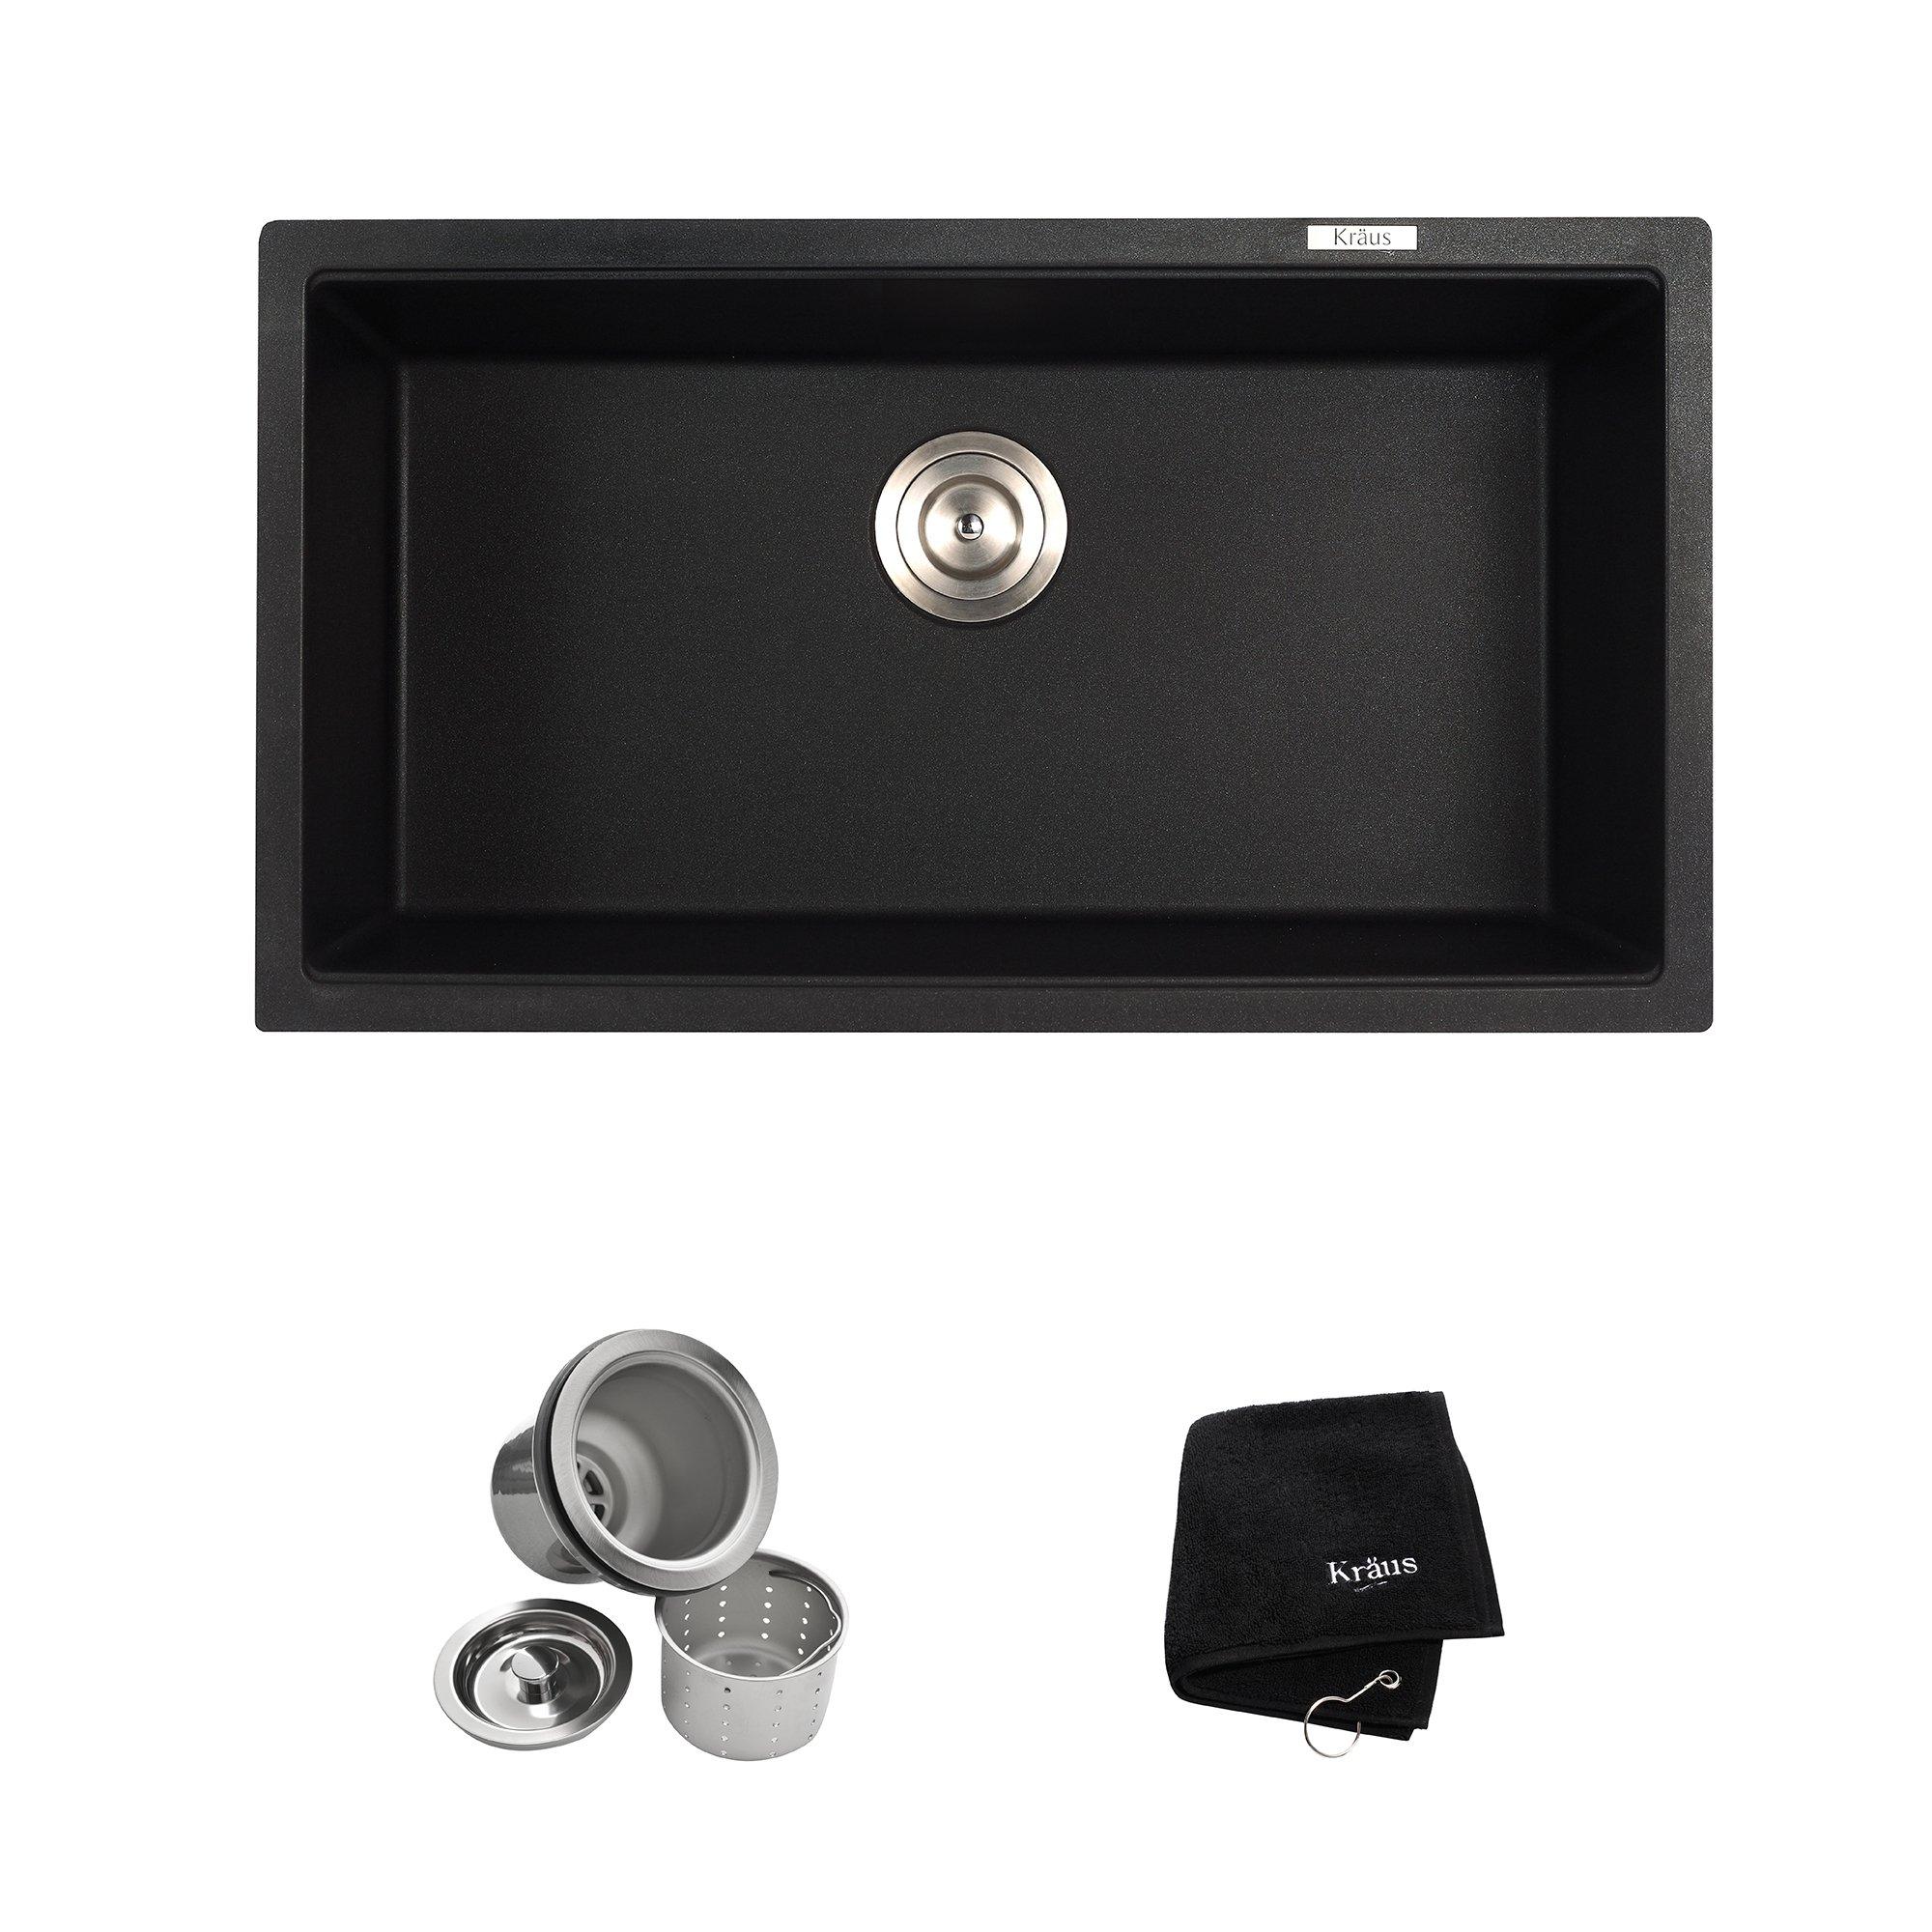 Kraus Kgu-413B 31 Inch Undermount Single Bowl Black Onyx Granite Kitchen Sink 22